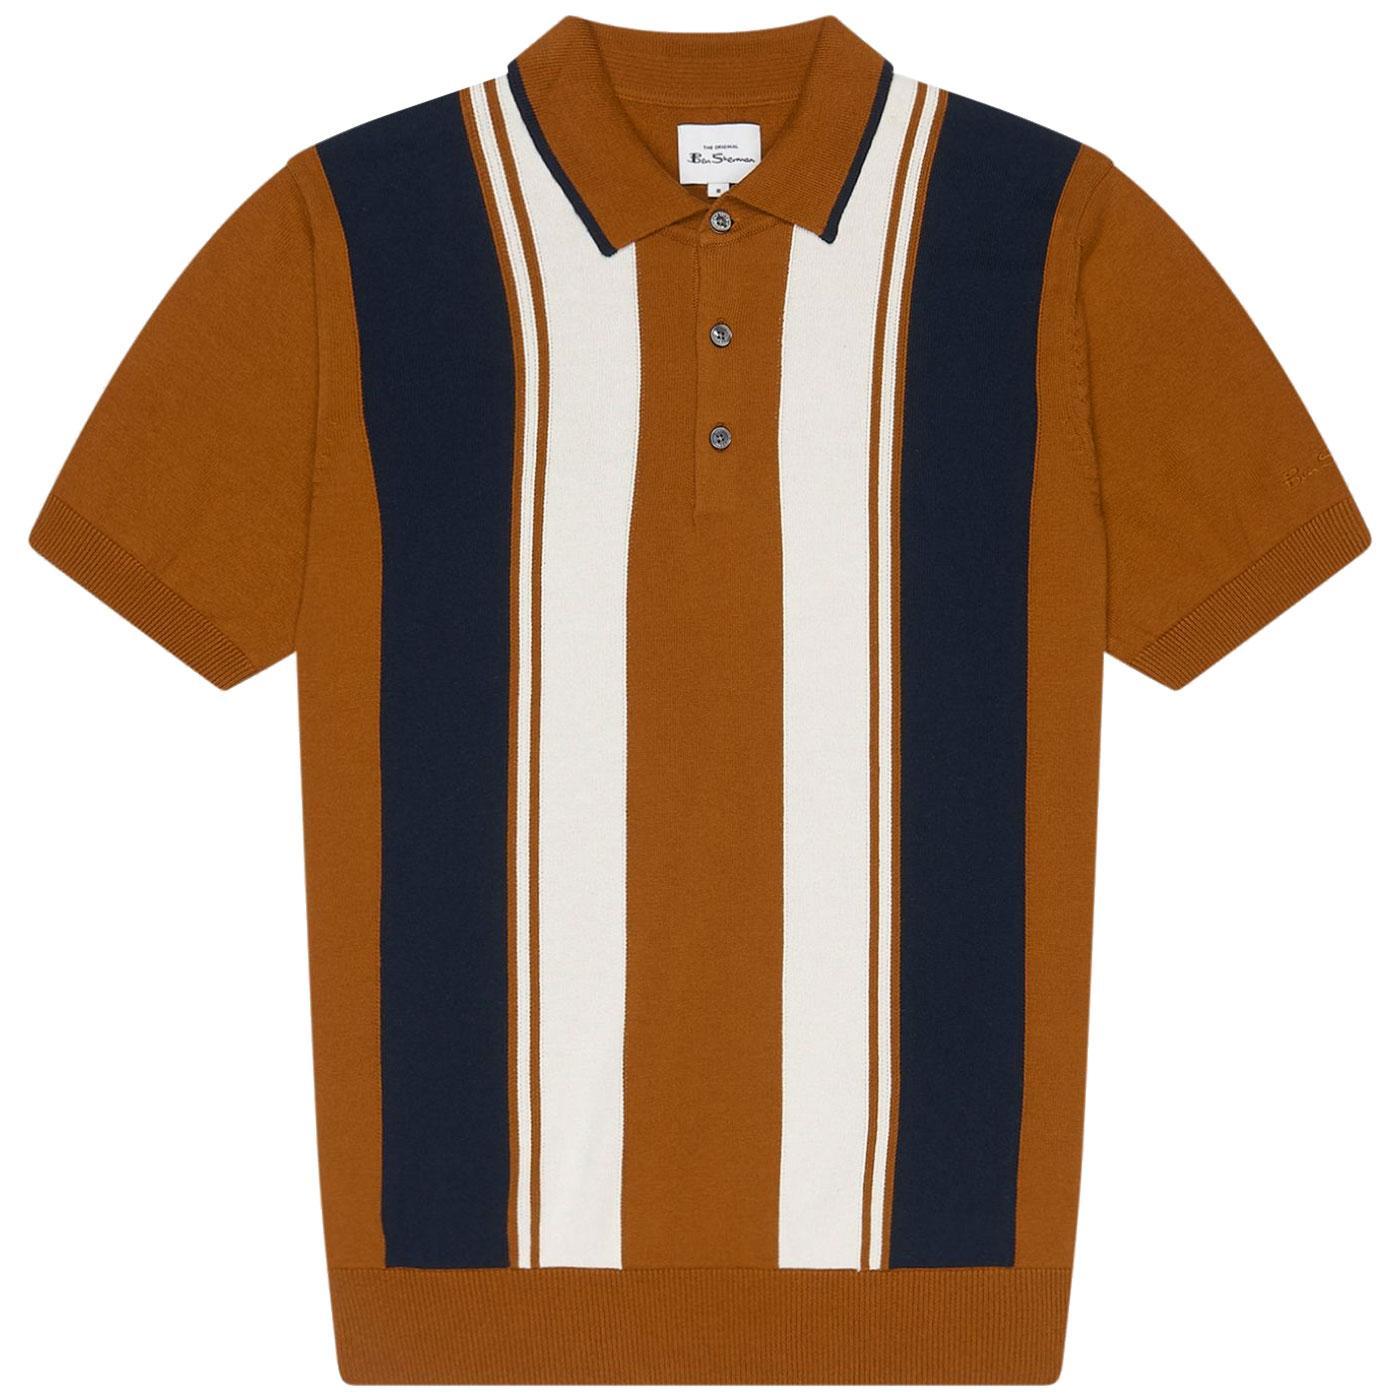 BEN SHERMAN Retro Knitted Mod Stripe Polo Shirt C